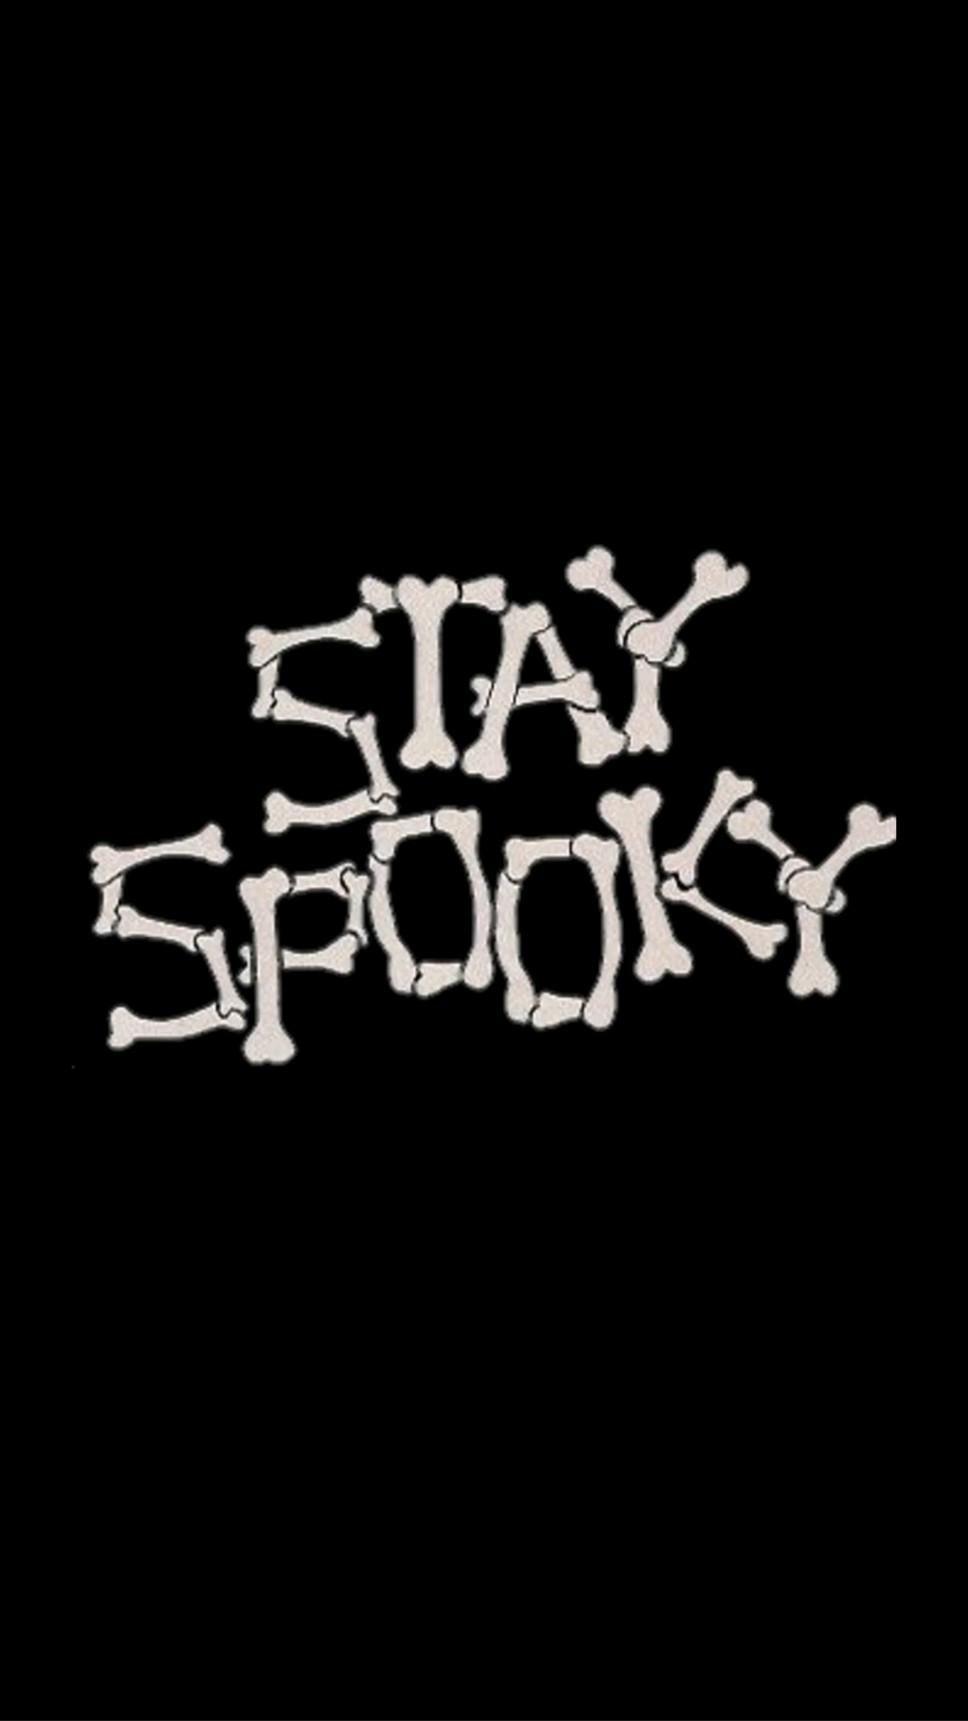 Stay Spooky halloween print. Halloween, spooky, witch, cute, funny, horror, vintage, skeleton.